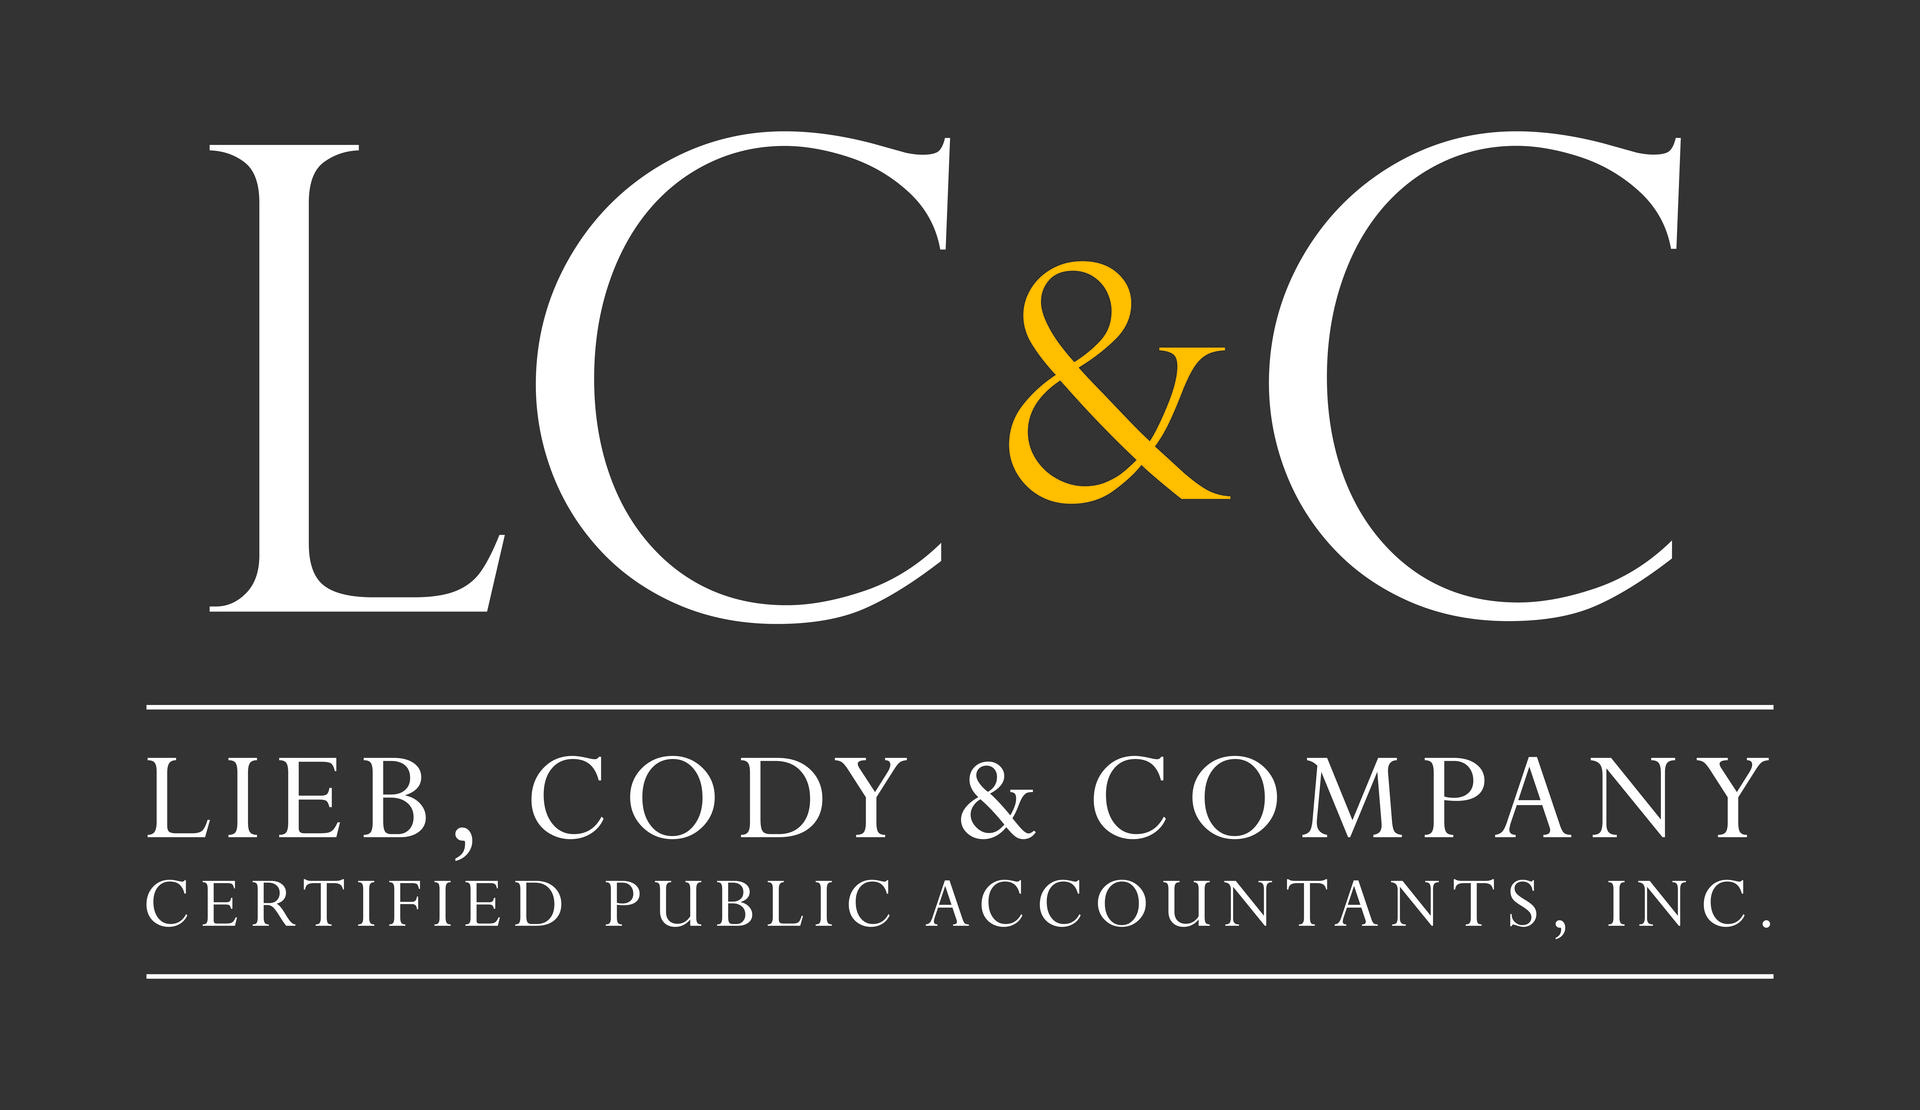 Lieb, Cody, & Company